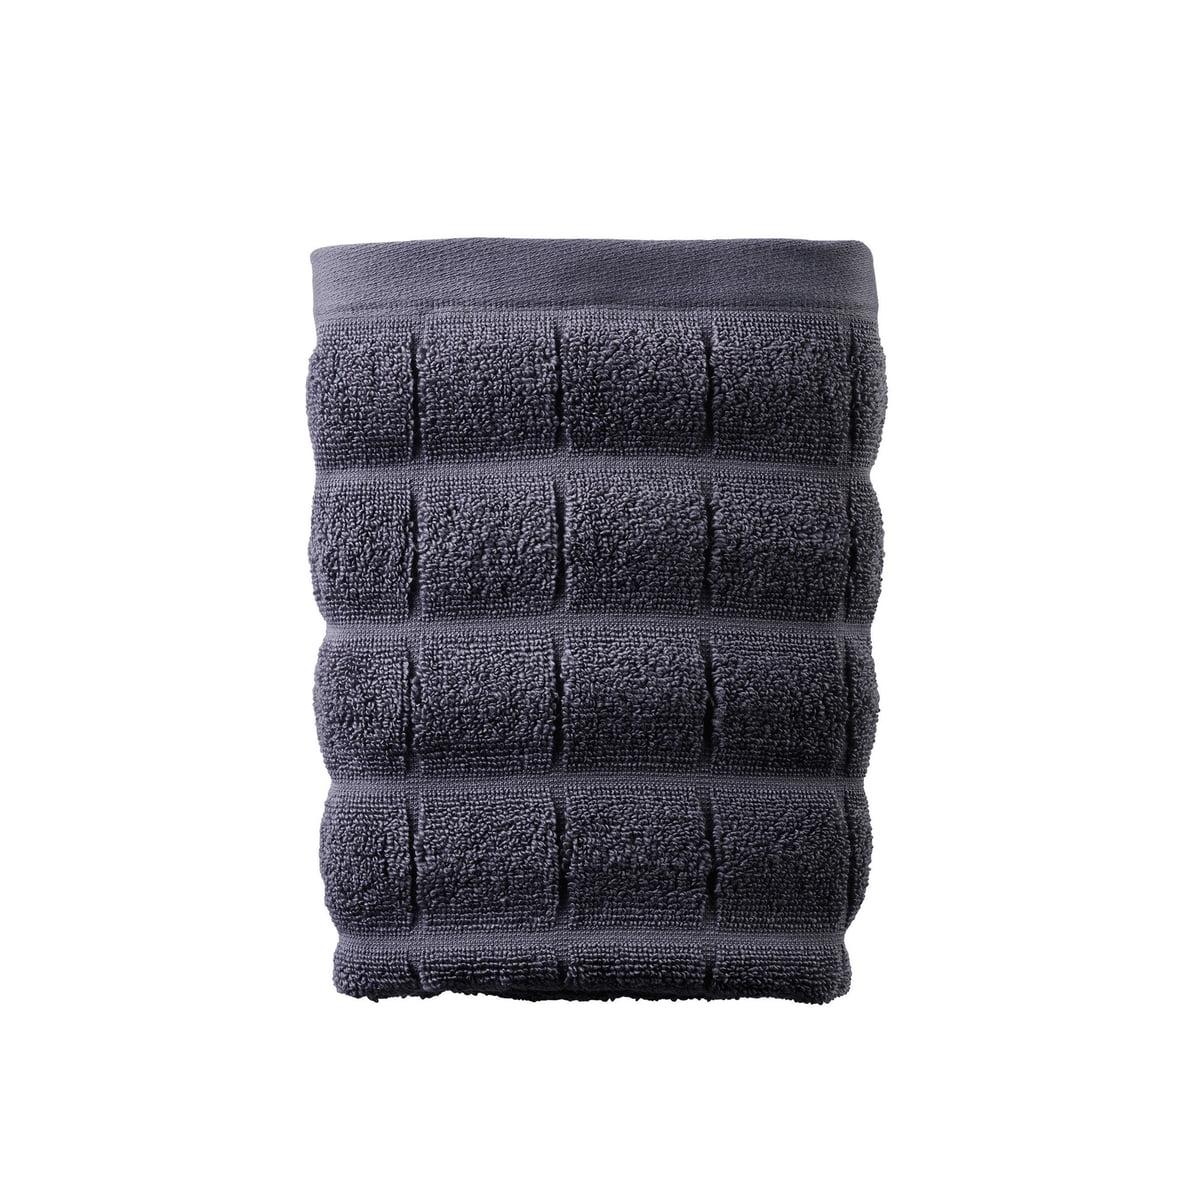 Juna - Tiles Handtuch 50 x 100 cm, castlerock   Bad > Handtücher > Handtuch-Sets   Blaugrau   Juna